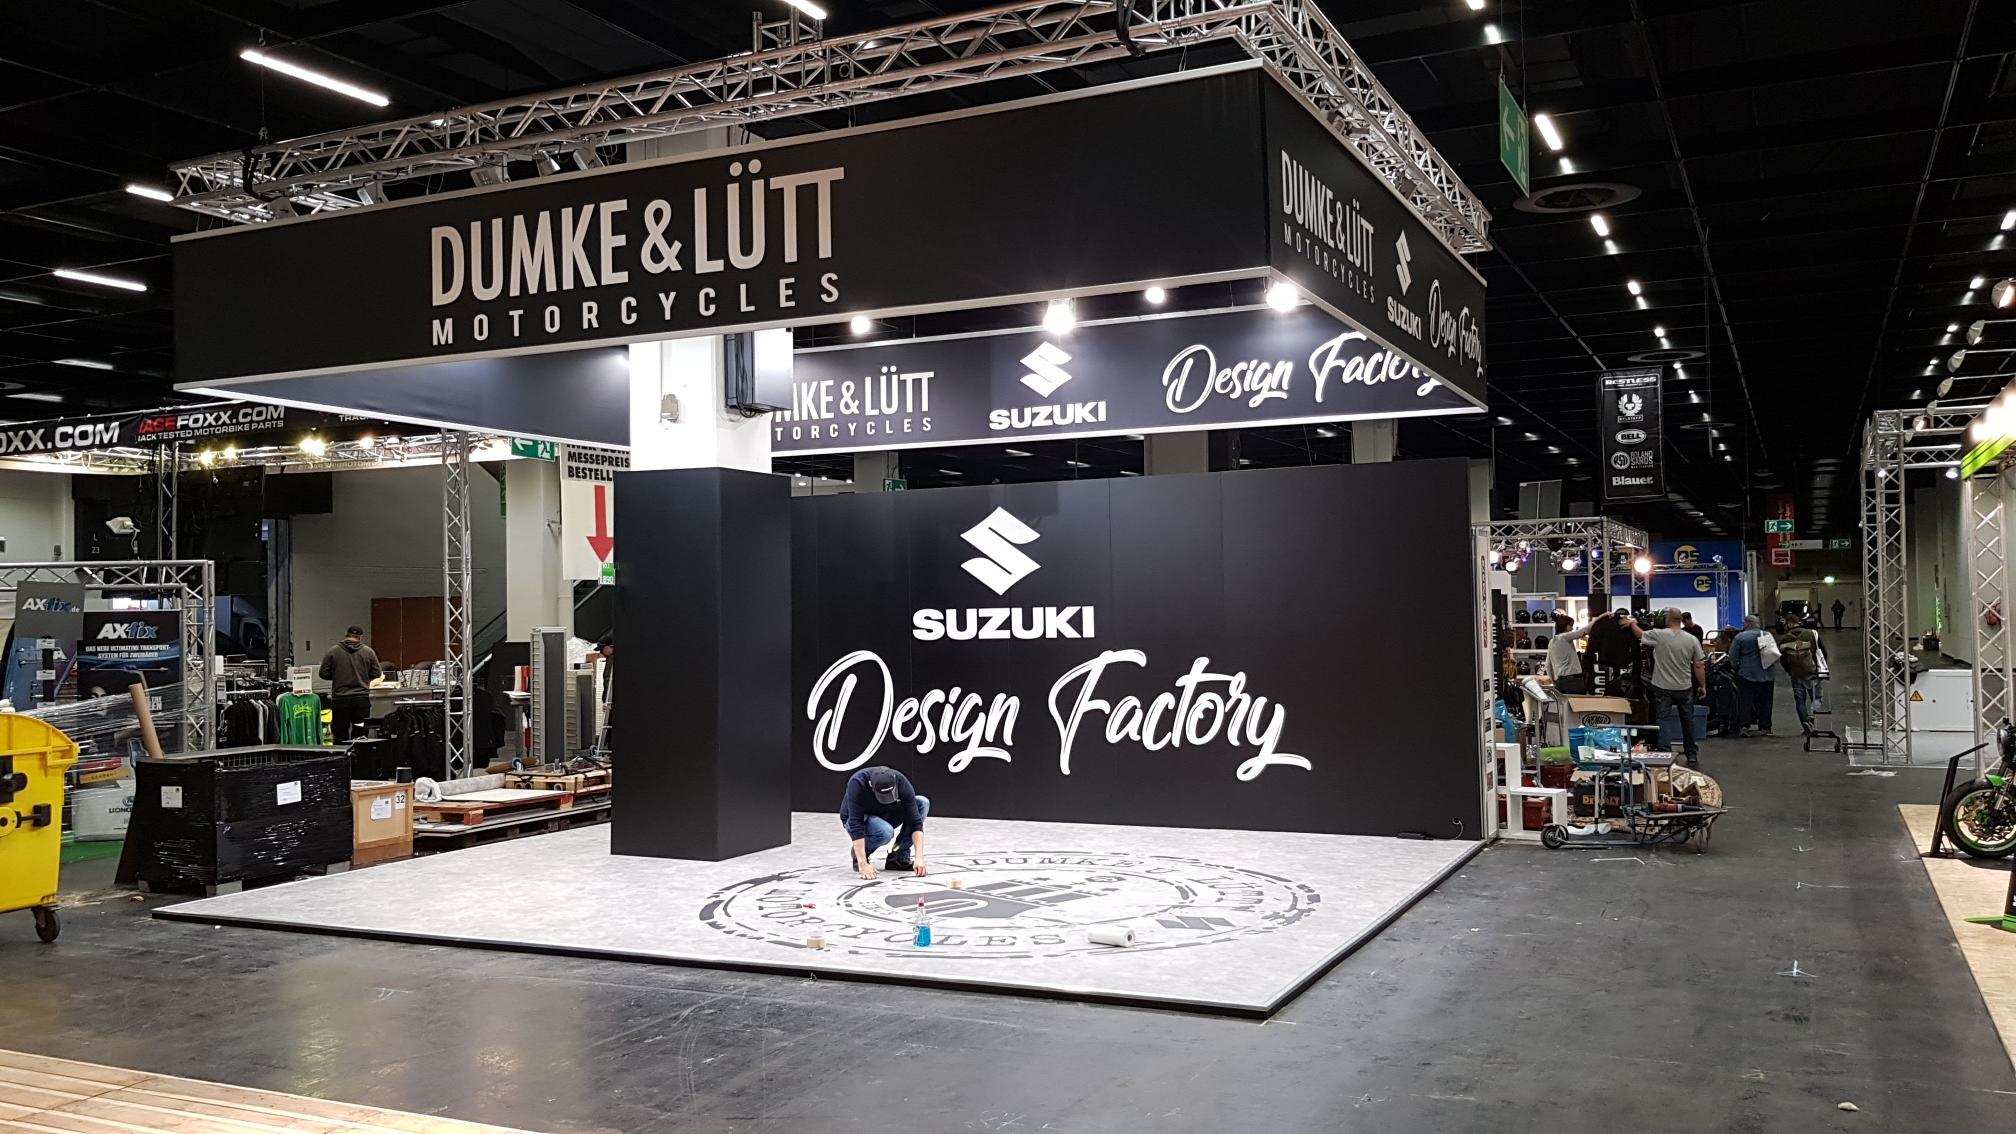 Dumke & Lütt @ Intermot 2018